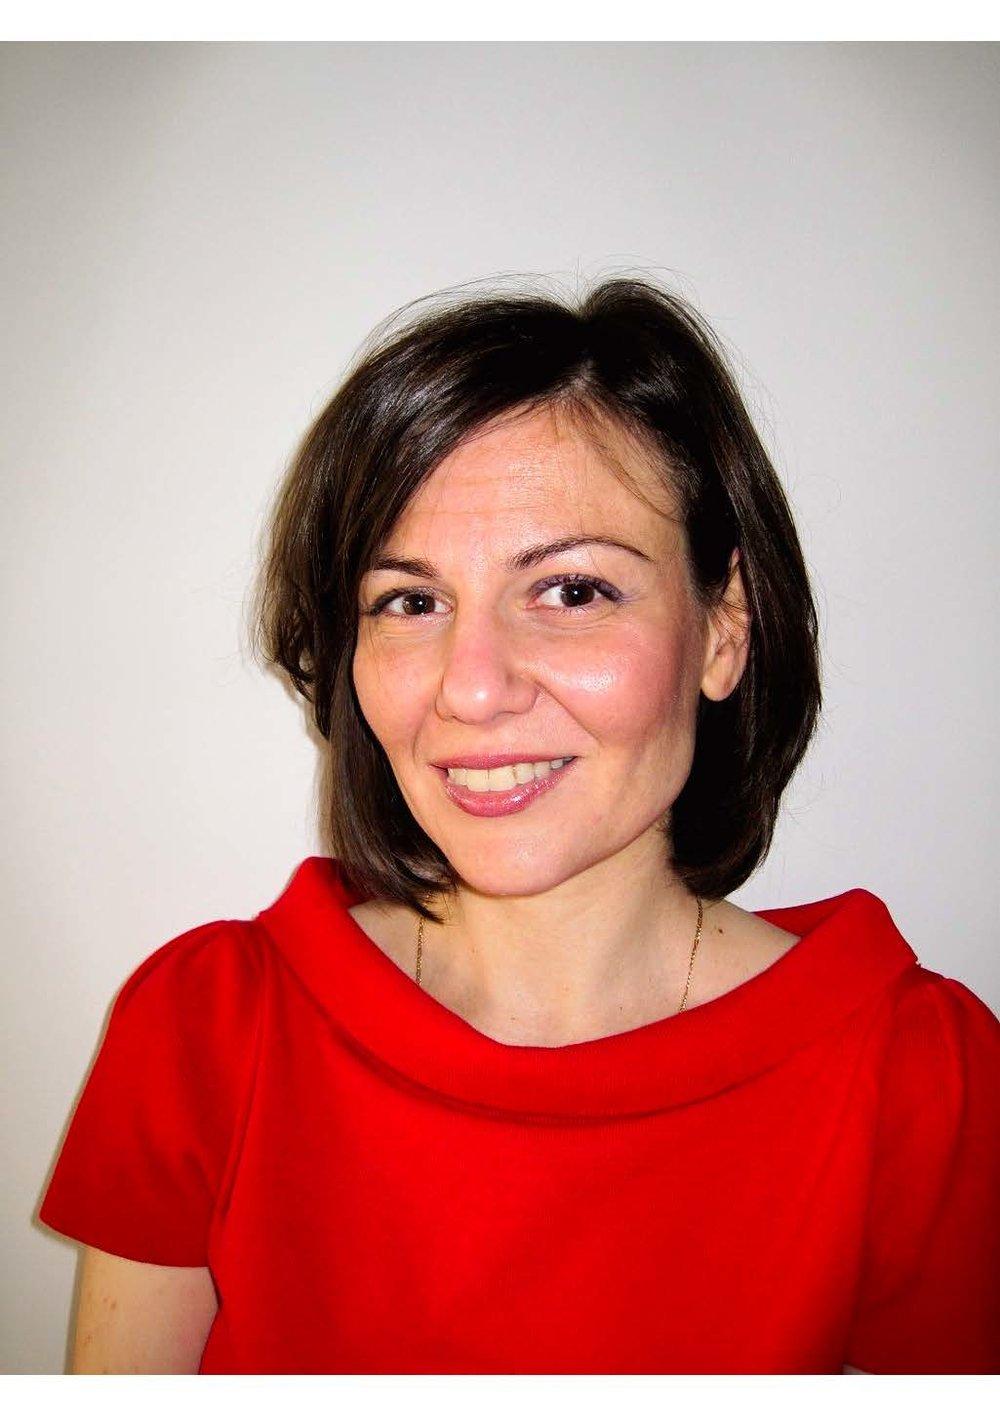 Maria Varaki, University of Helsinki <br> Kathleen Fitzpatrick Visiting Postdoctoral Fellow 2017